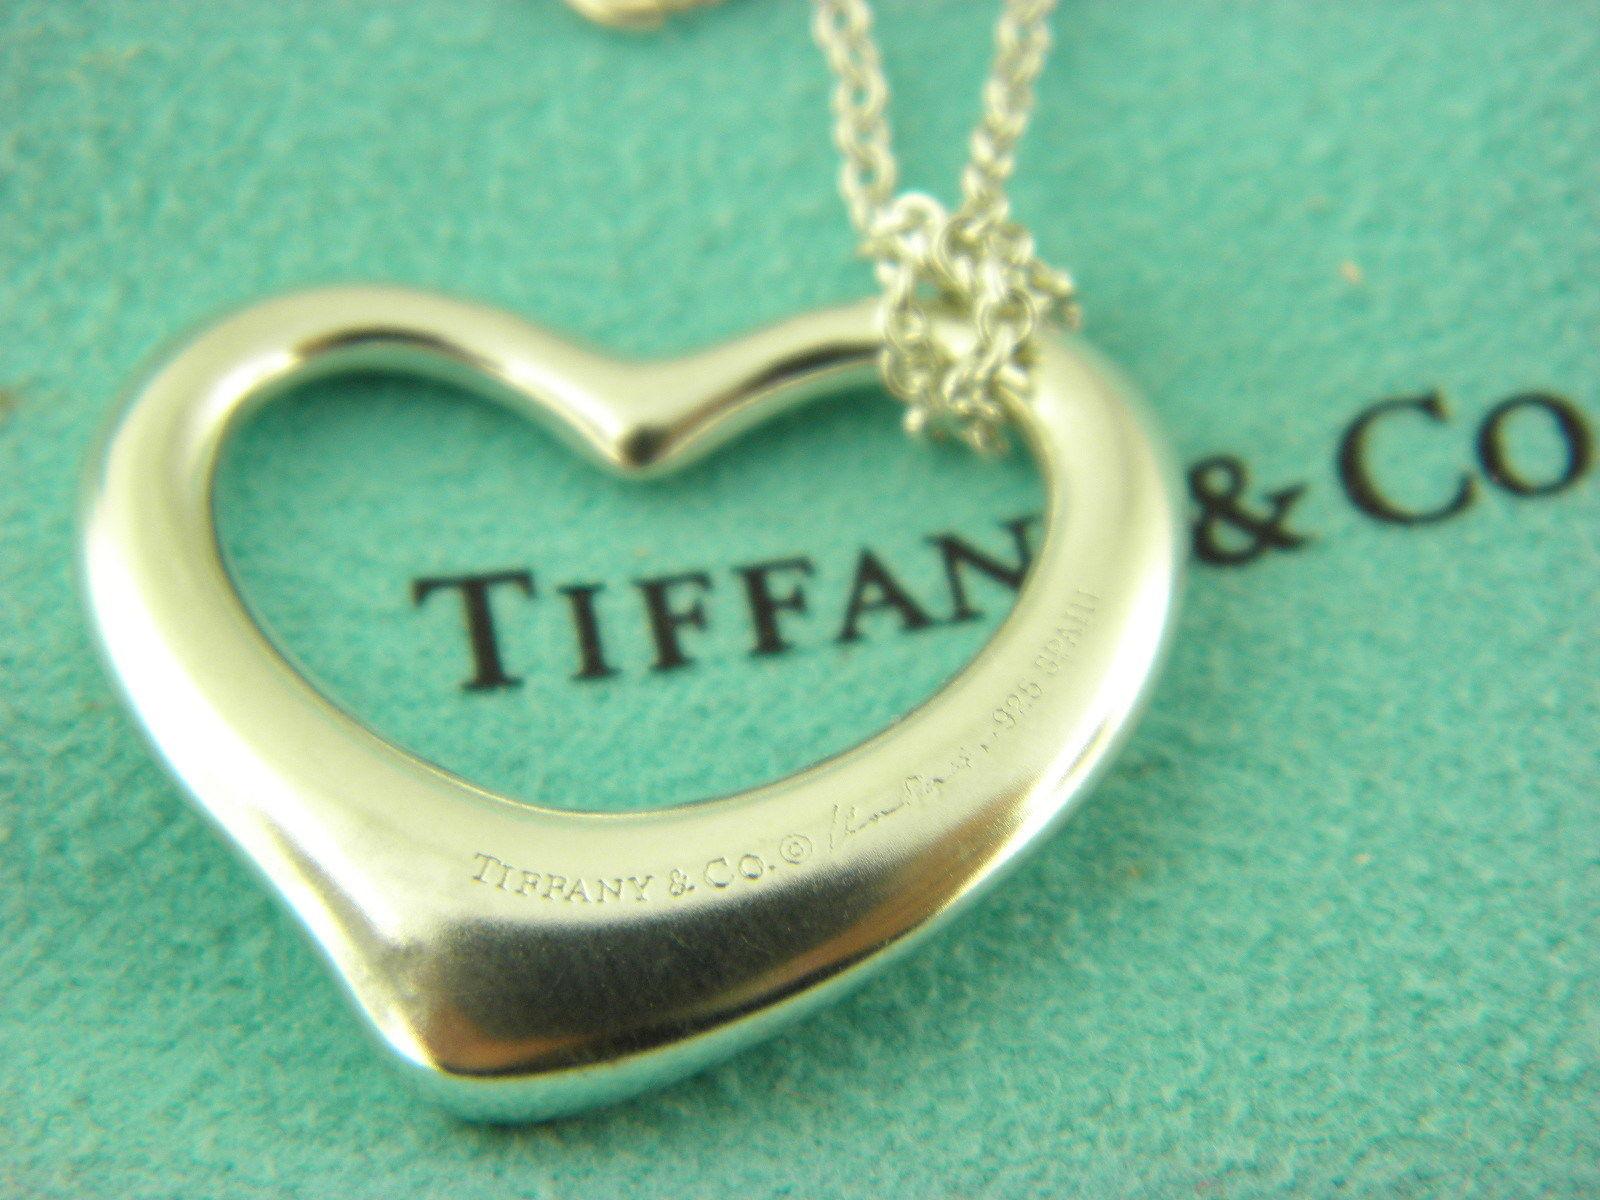 Tiffany co elsa peretti necklace 2 customer reviews and 40 listings tiffany co elsa peretti open heart pendant necklace in sterling silver 28611 aloadofball Gallery